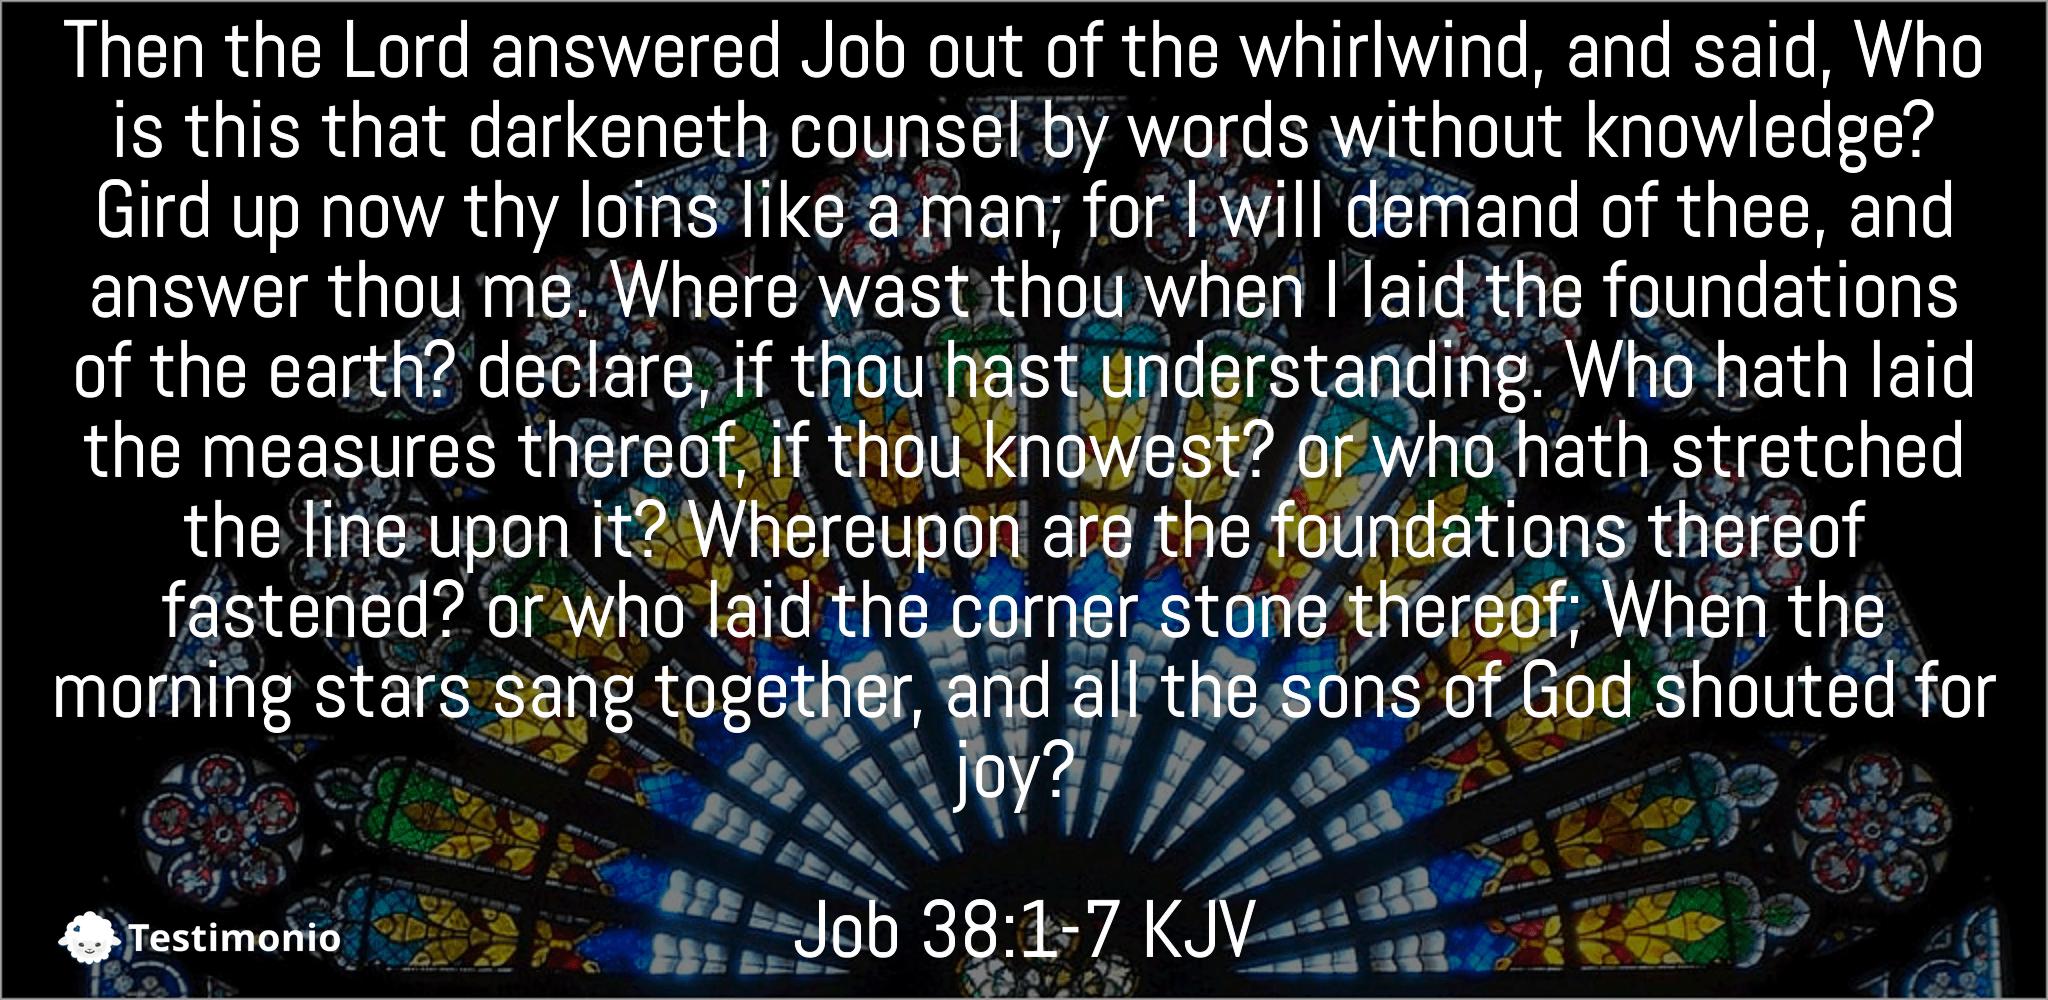 Job 38:1-7